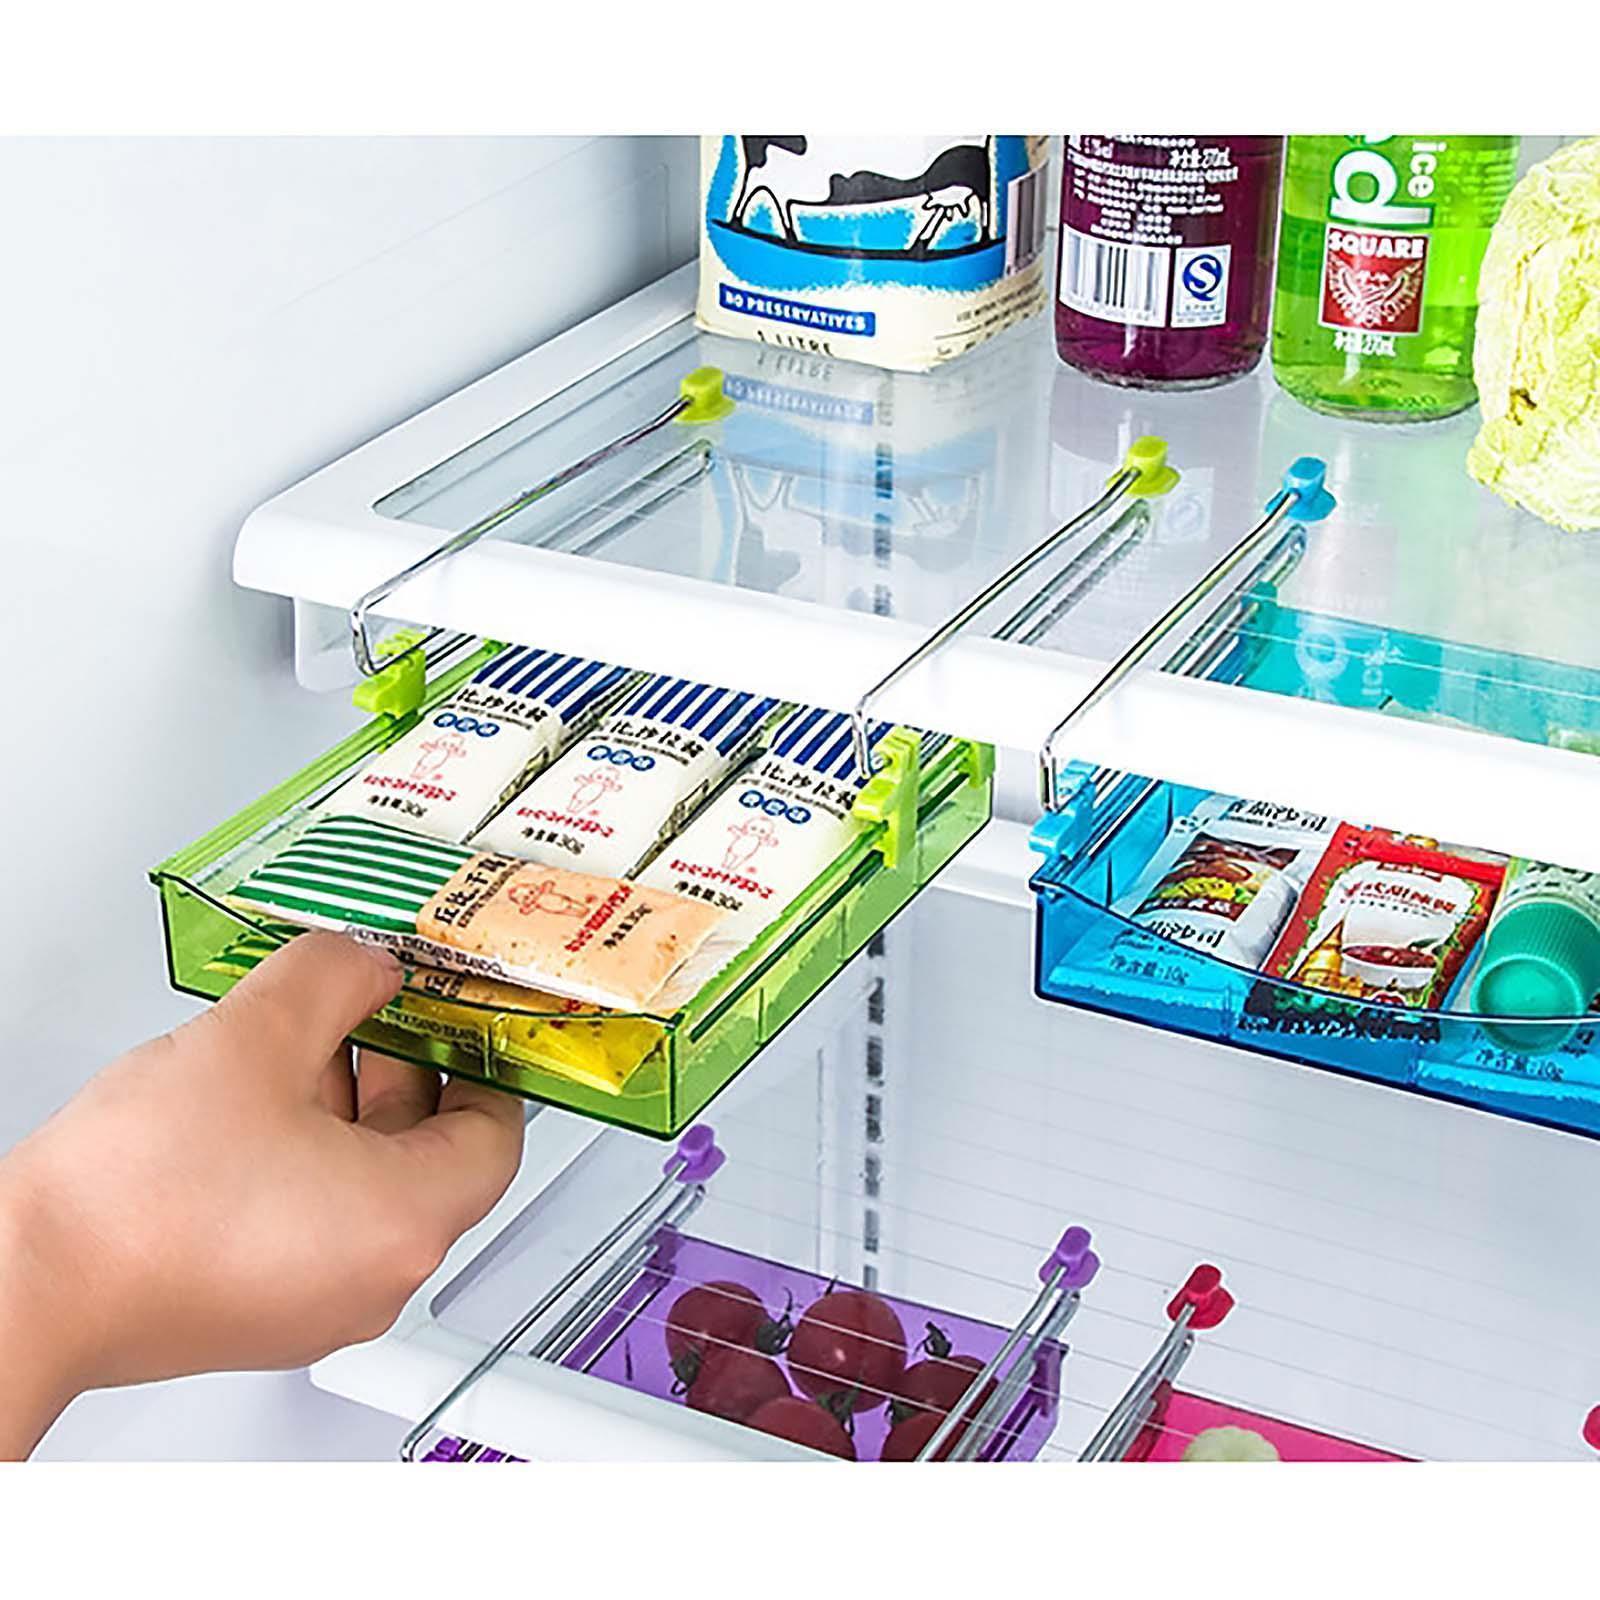 1Pcs Spice Rack Shelf Refrigerator Food Fresh Layer Space Efficient Storage Rack 1